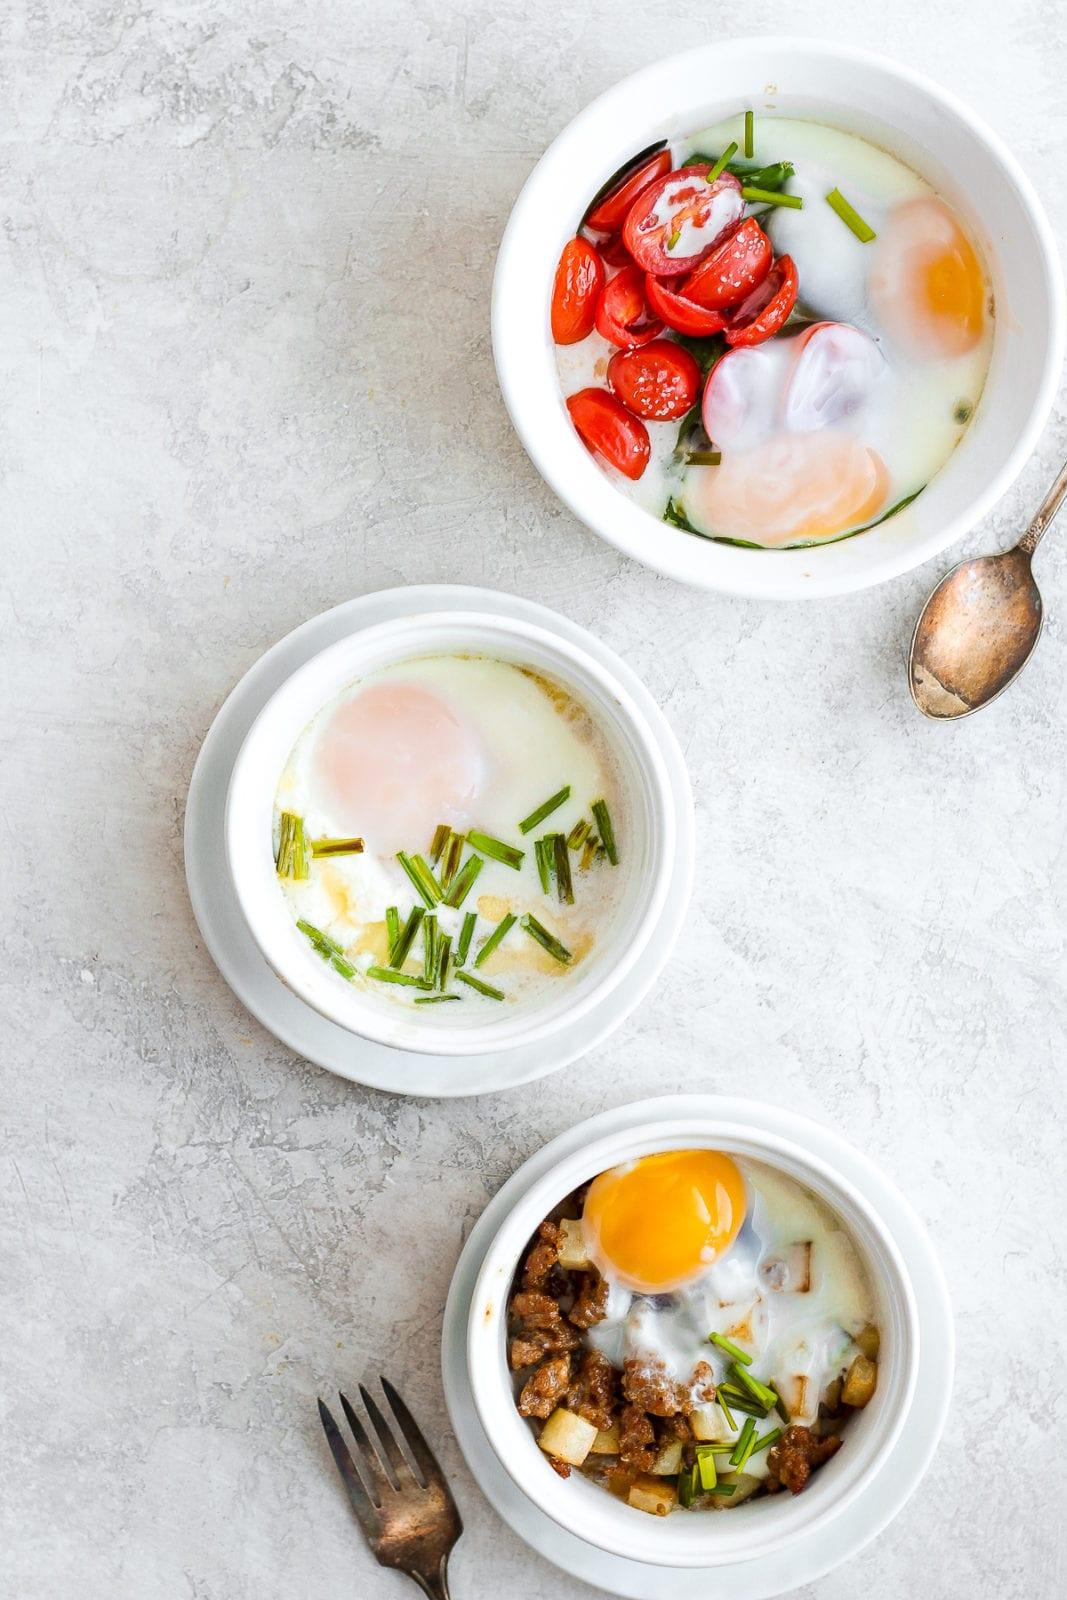 Baked Eggs Three Ways - a simple and delicious breakfast three yummy ways! #dairyfree #bakedeggs #breakfast #healthybreakfast #whole30 #paleo